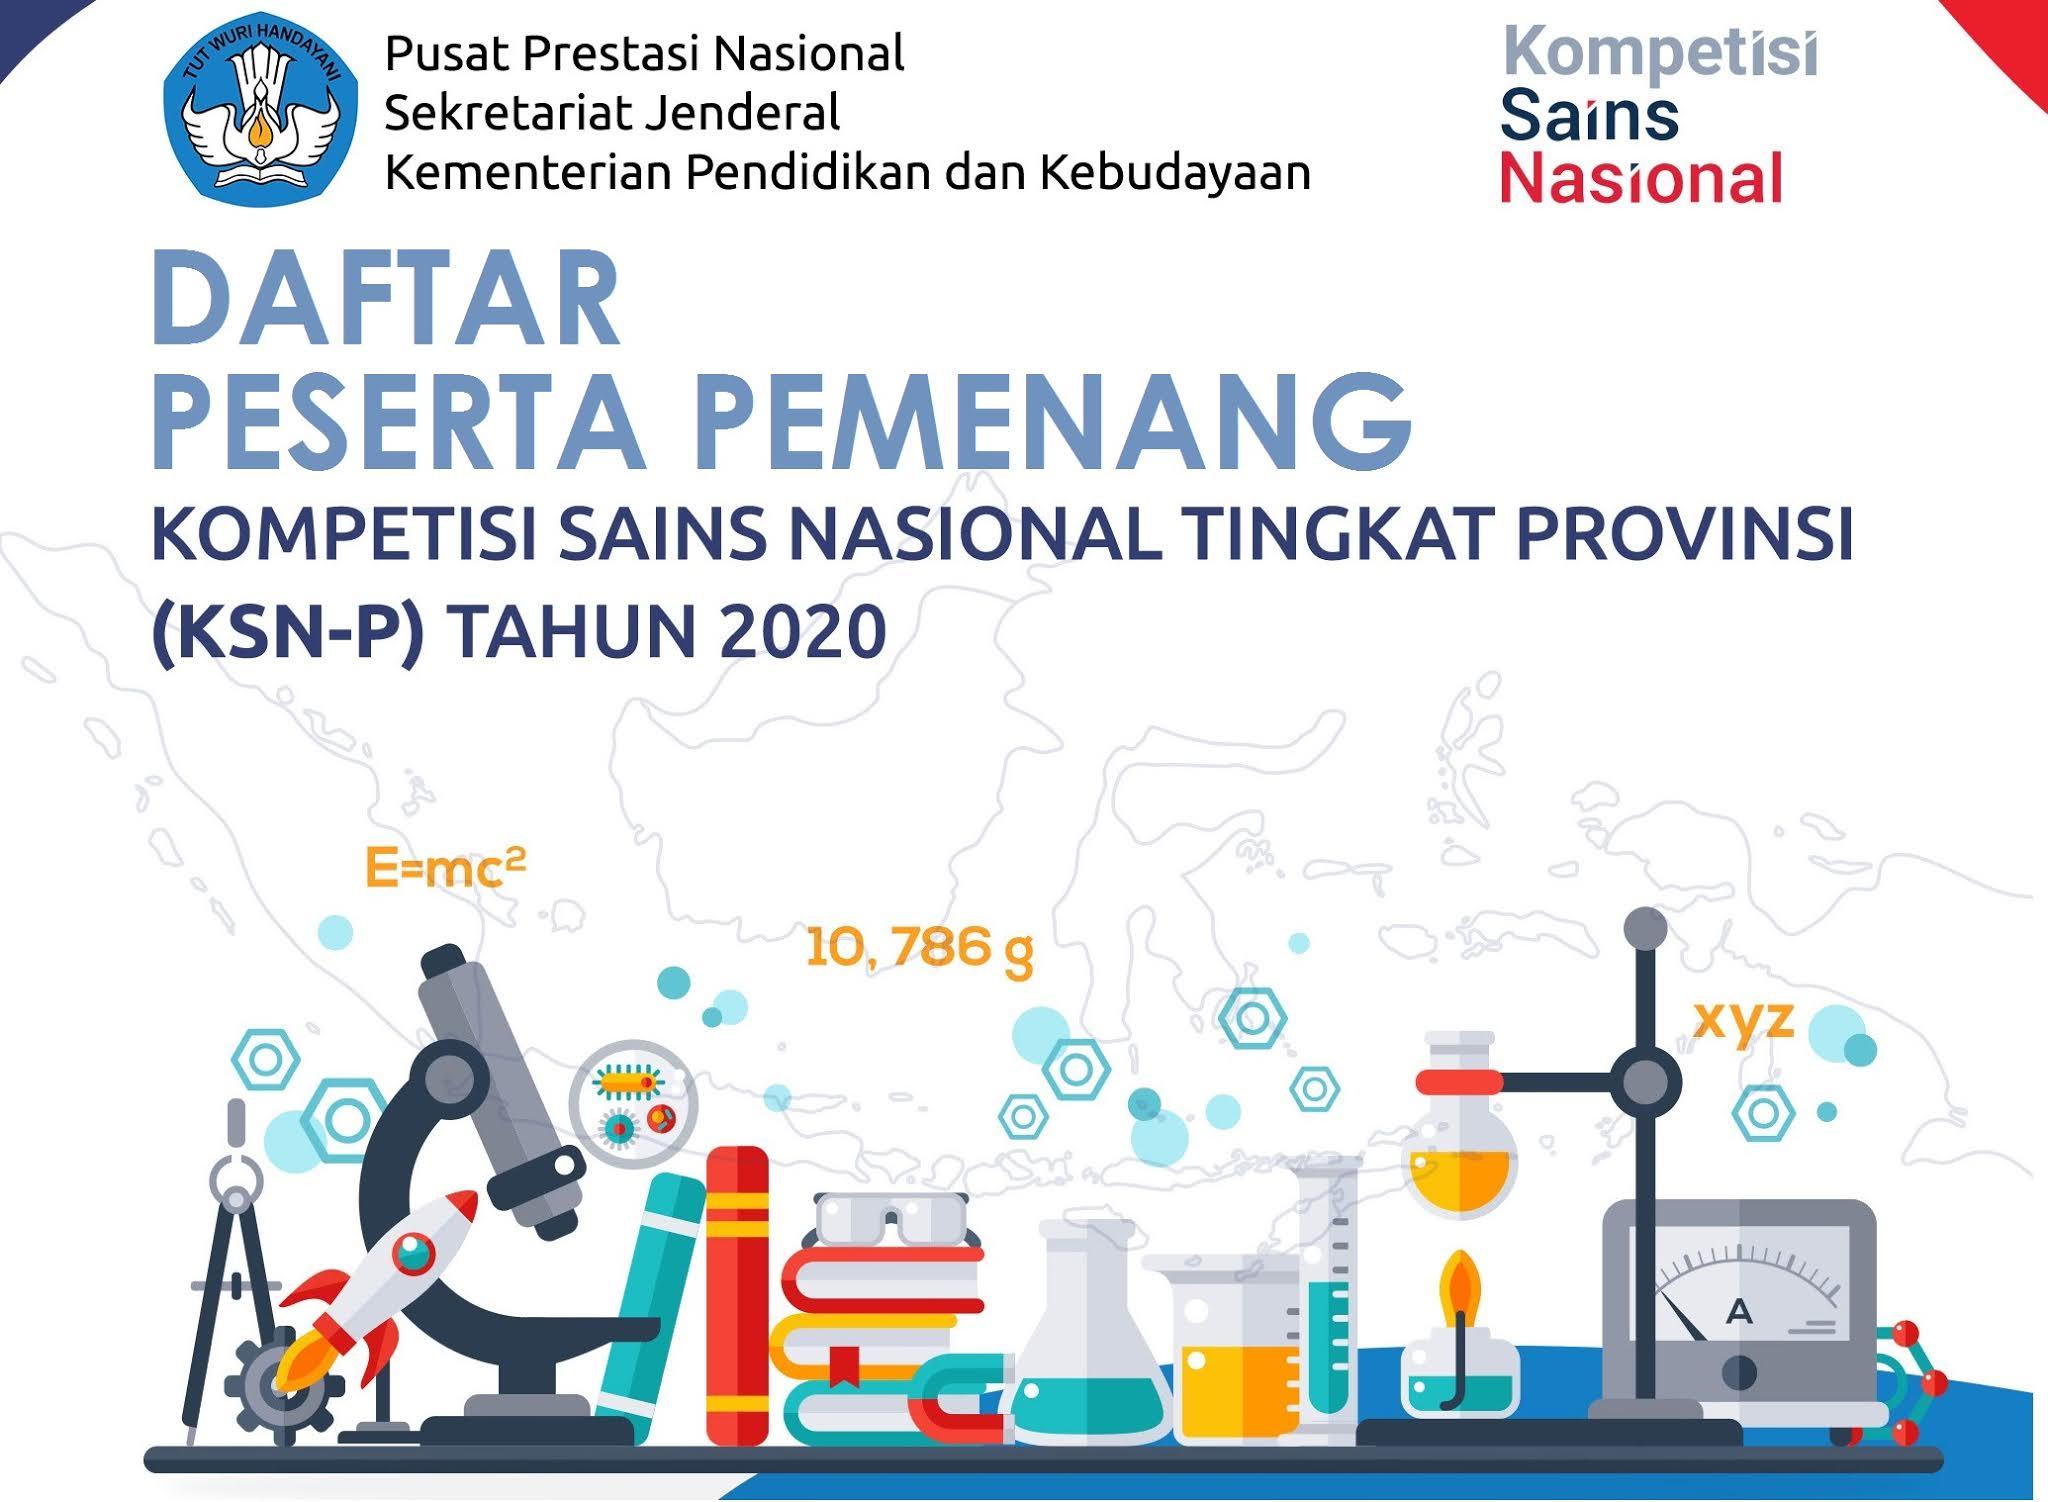 Pengumuman Peserta Pemenang Kompetisi Sains Nasional Tingkat Propinsi (KSN-P) Tahun 2020